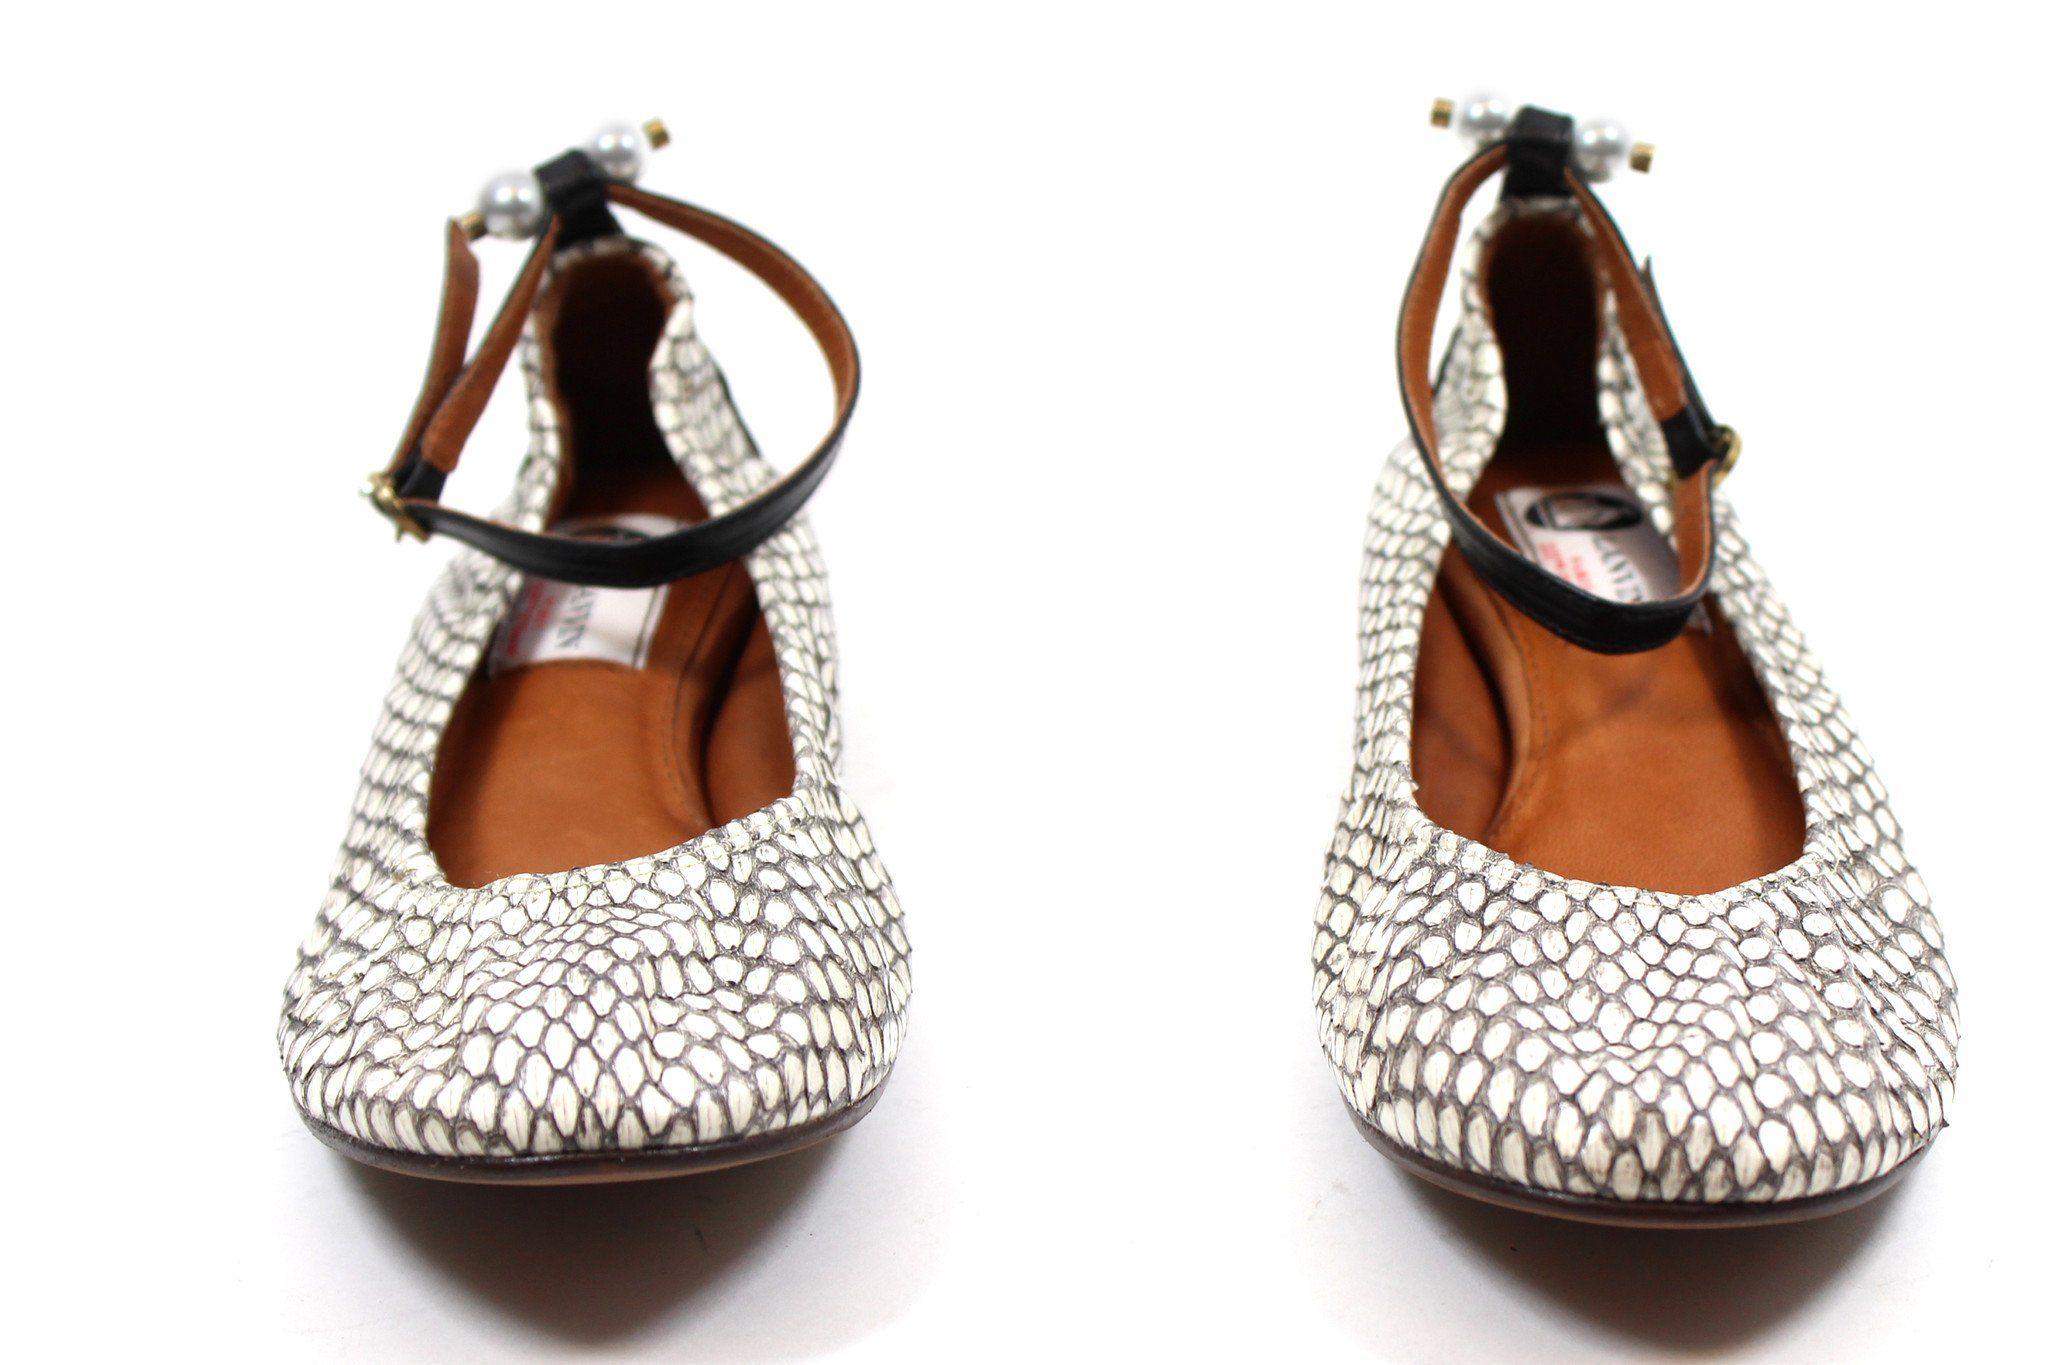 18768a95994 Lanvin Snakeskin Pearl Detail Ballet Flats w  Ankle Strap (Size 38.5 ...